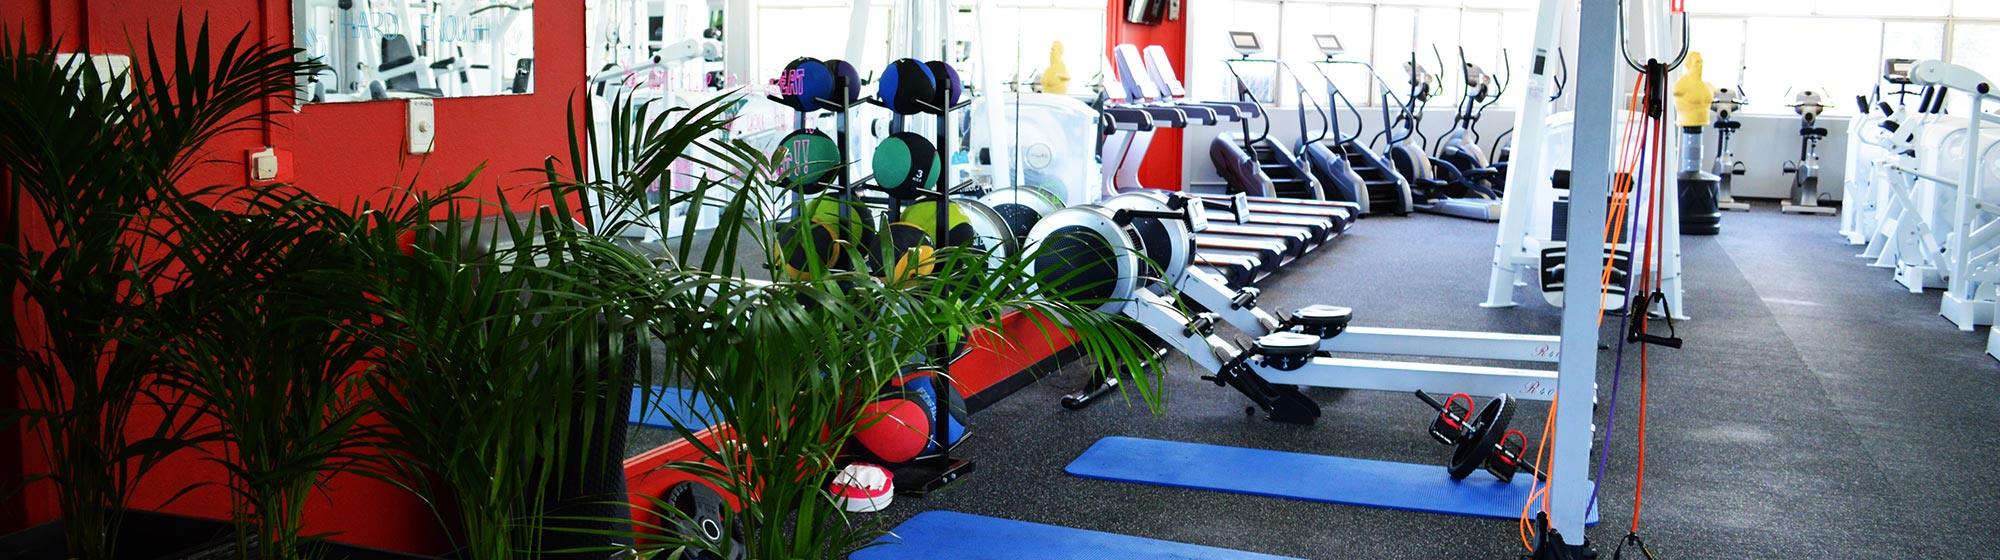 darwin suburbs gym